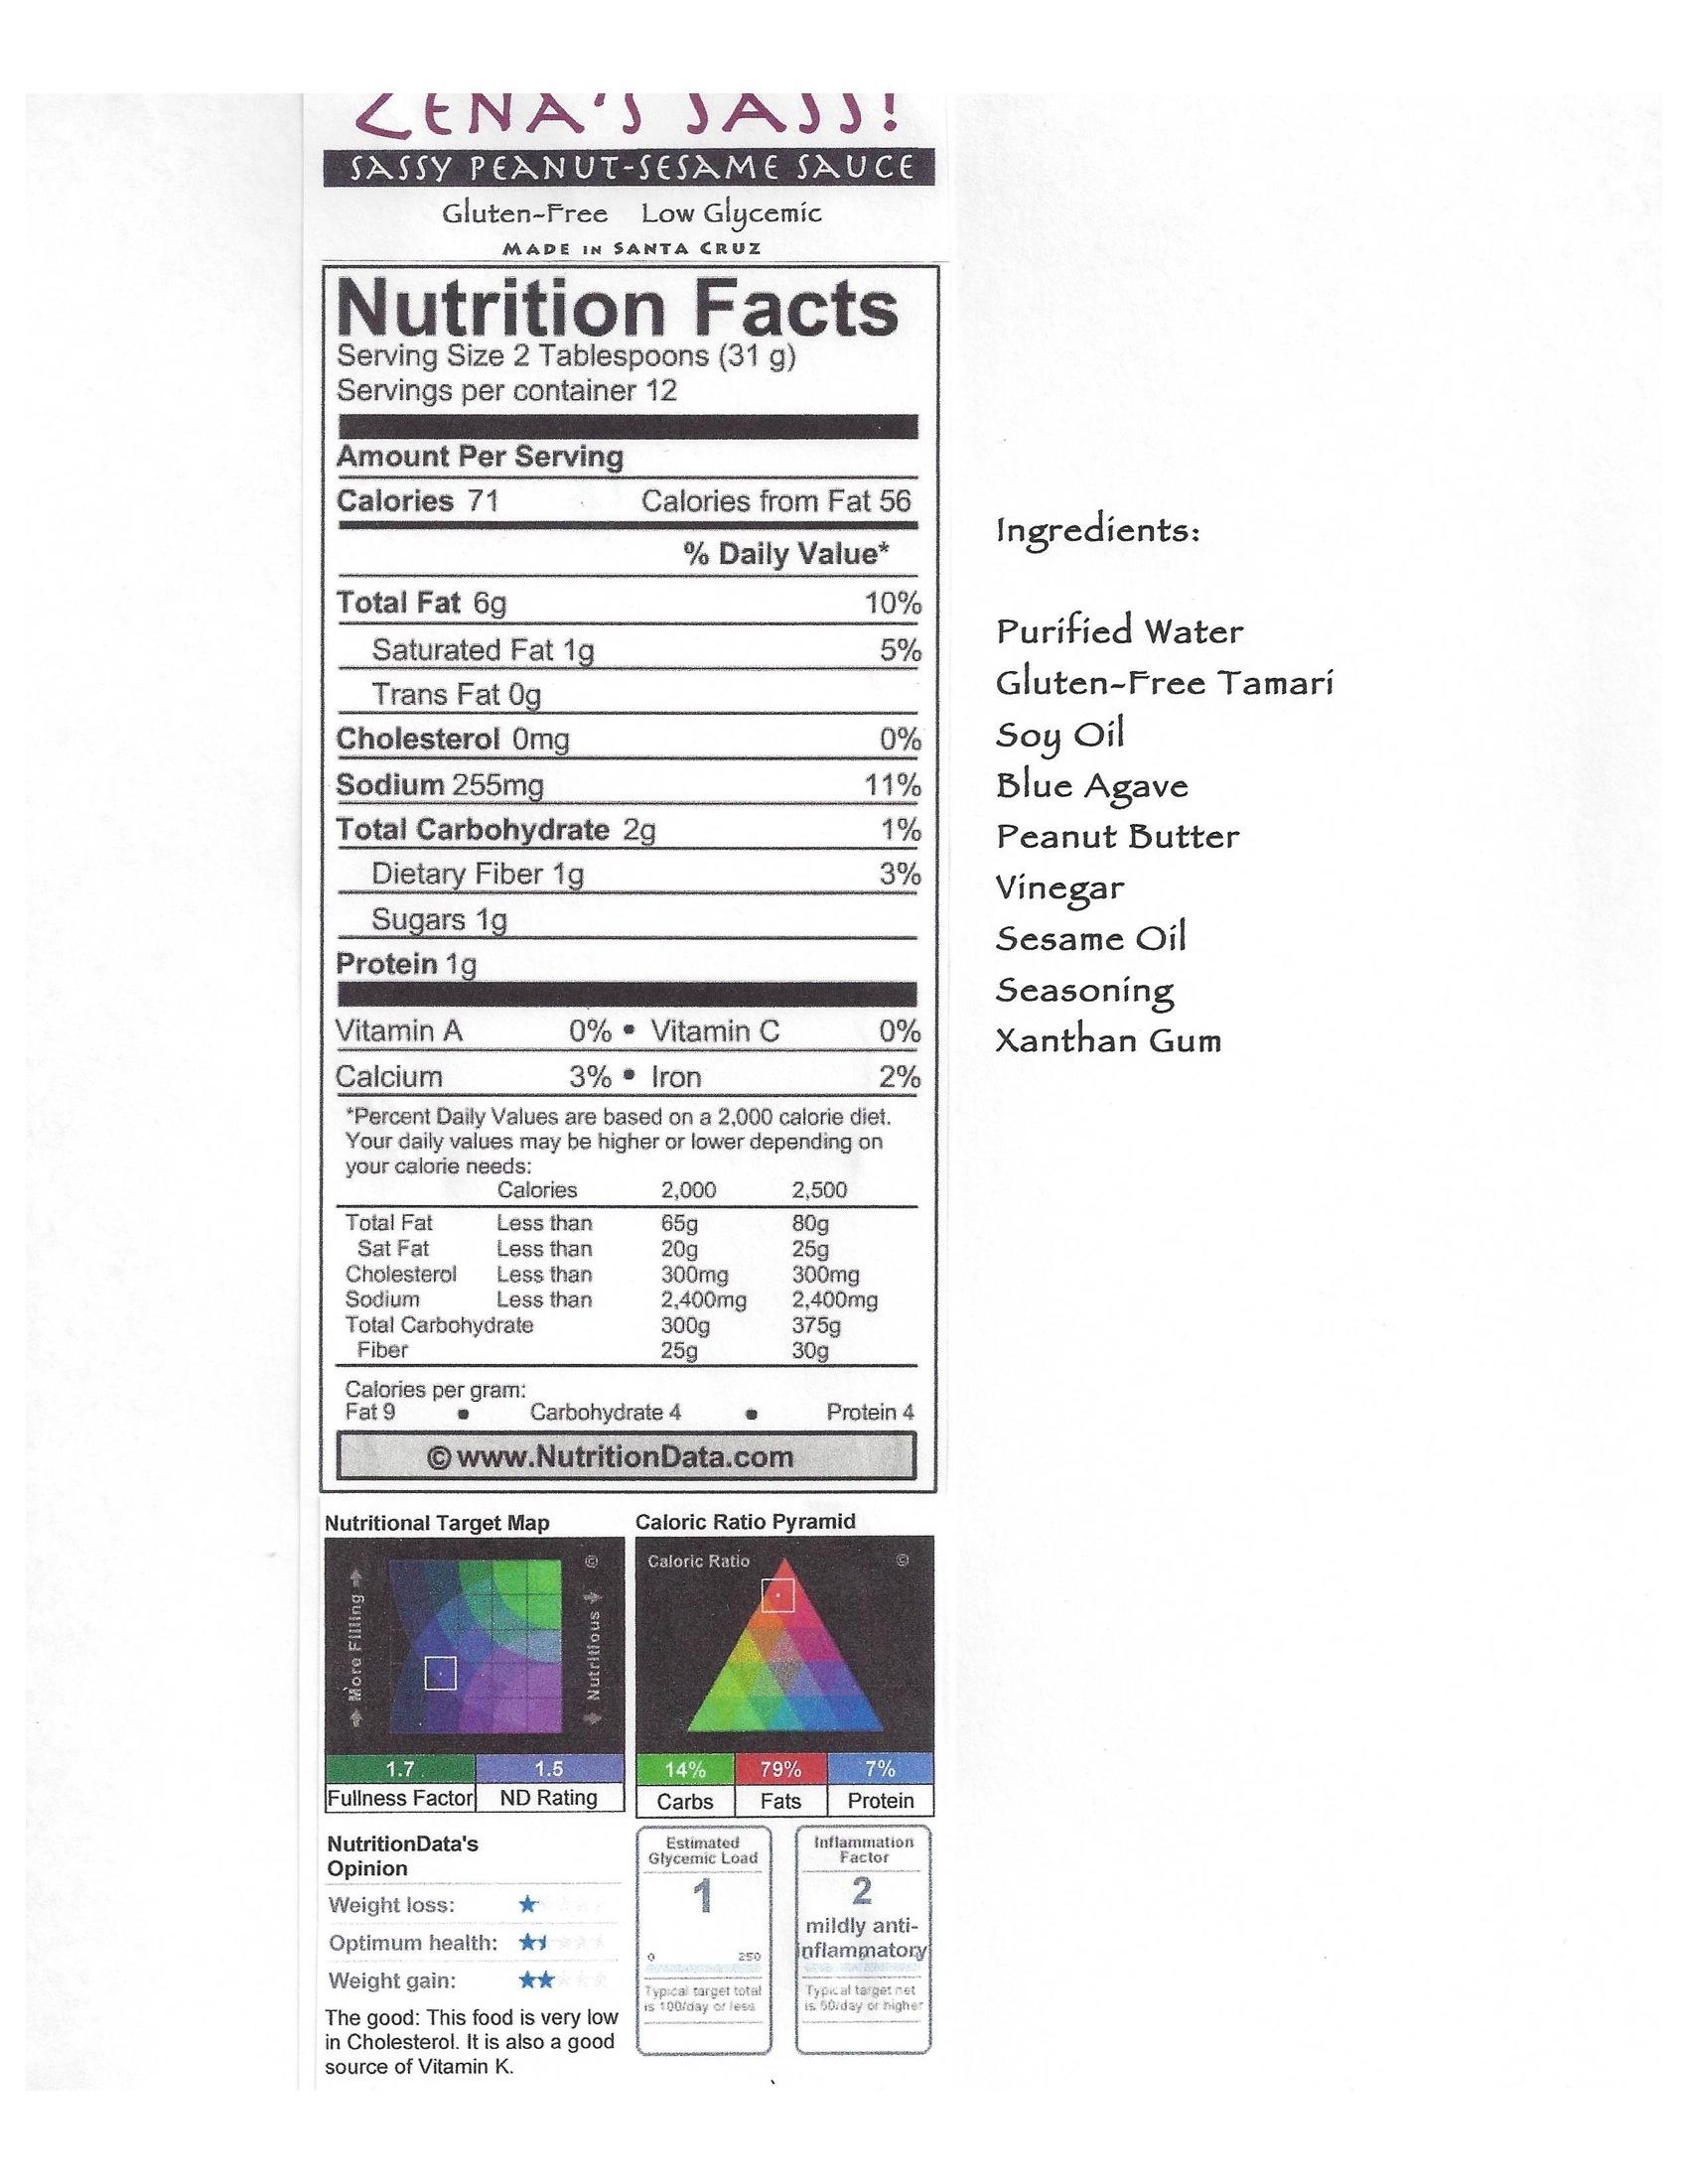 sassy-peanut-sesame-sauce-nutritional-information